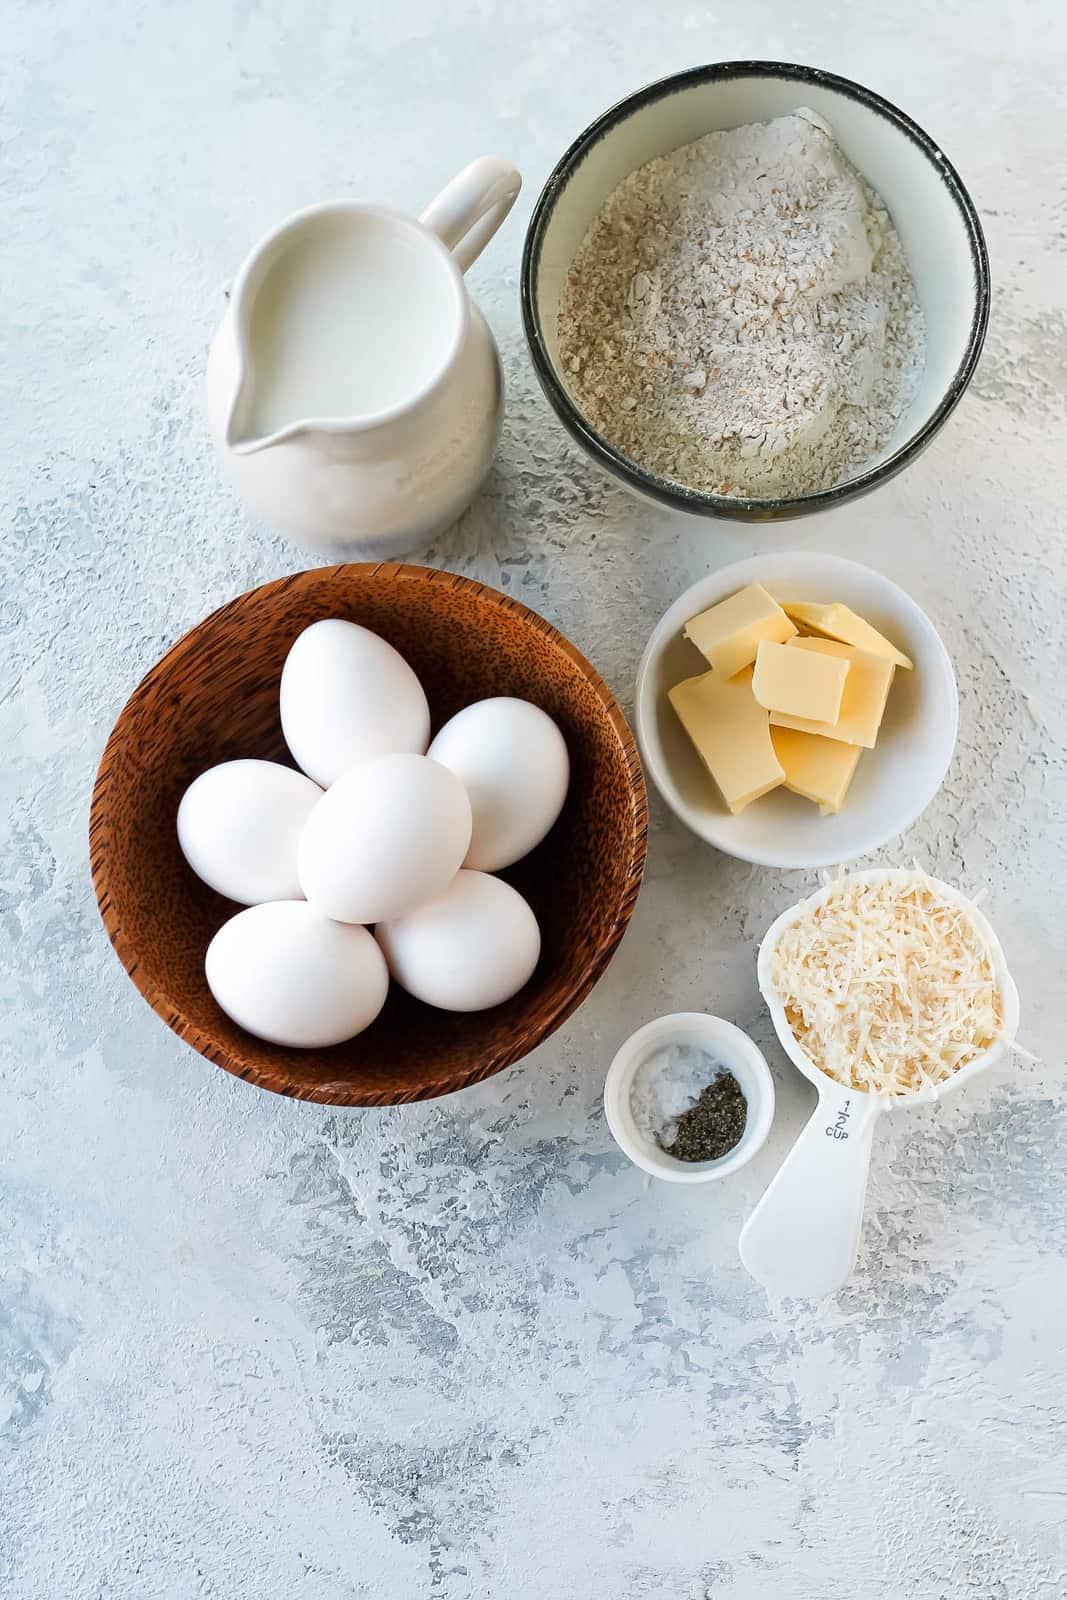 eggs, milk, flour, butter, parmesan, salt, and pepper on a grey background